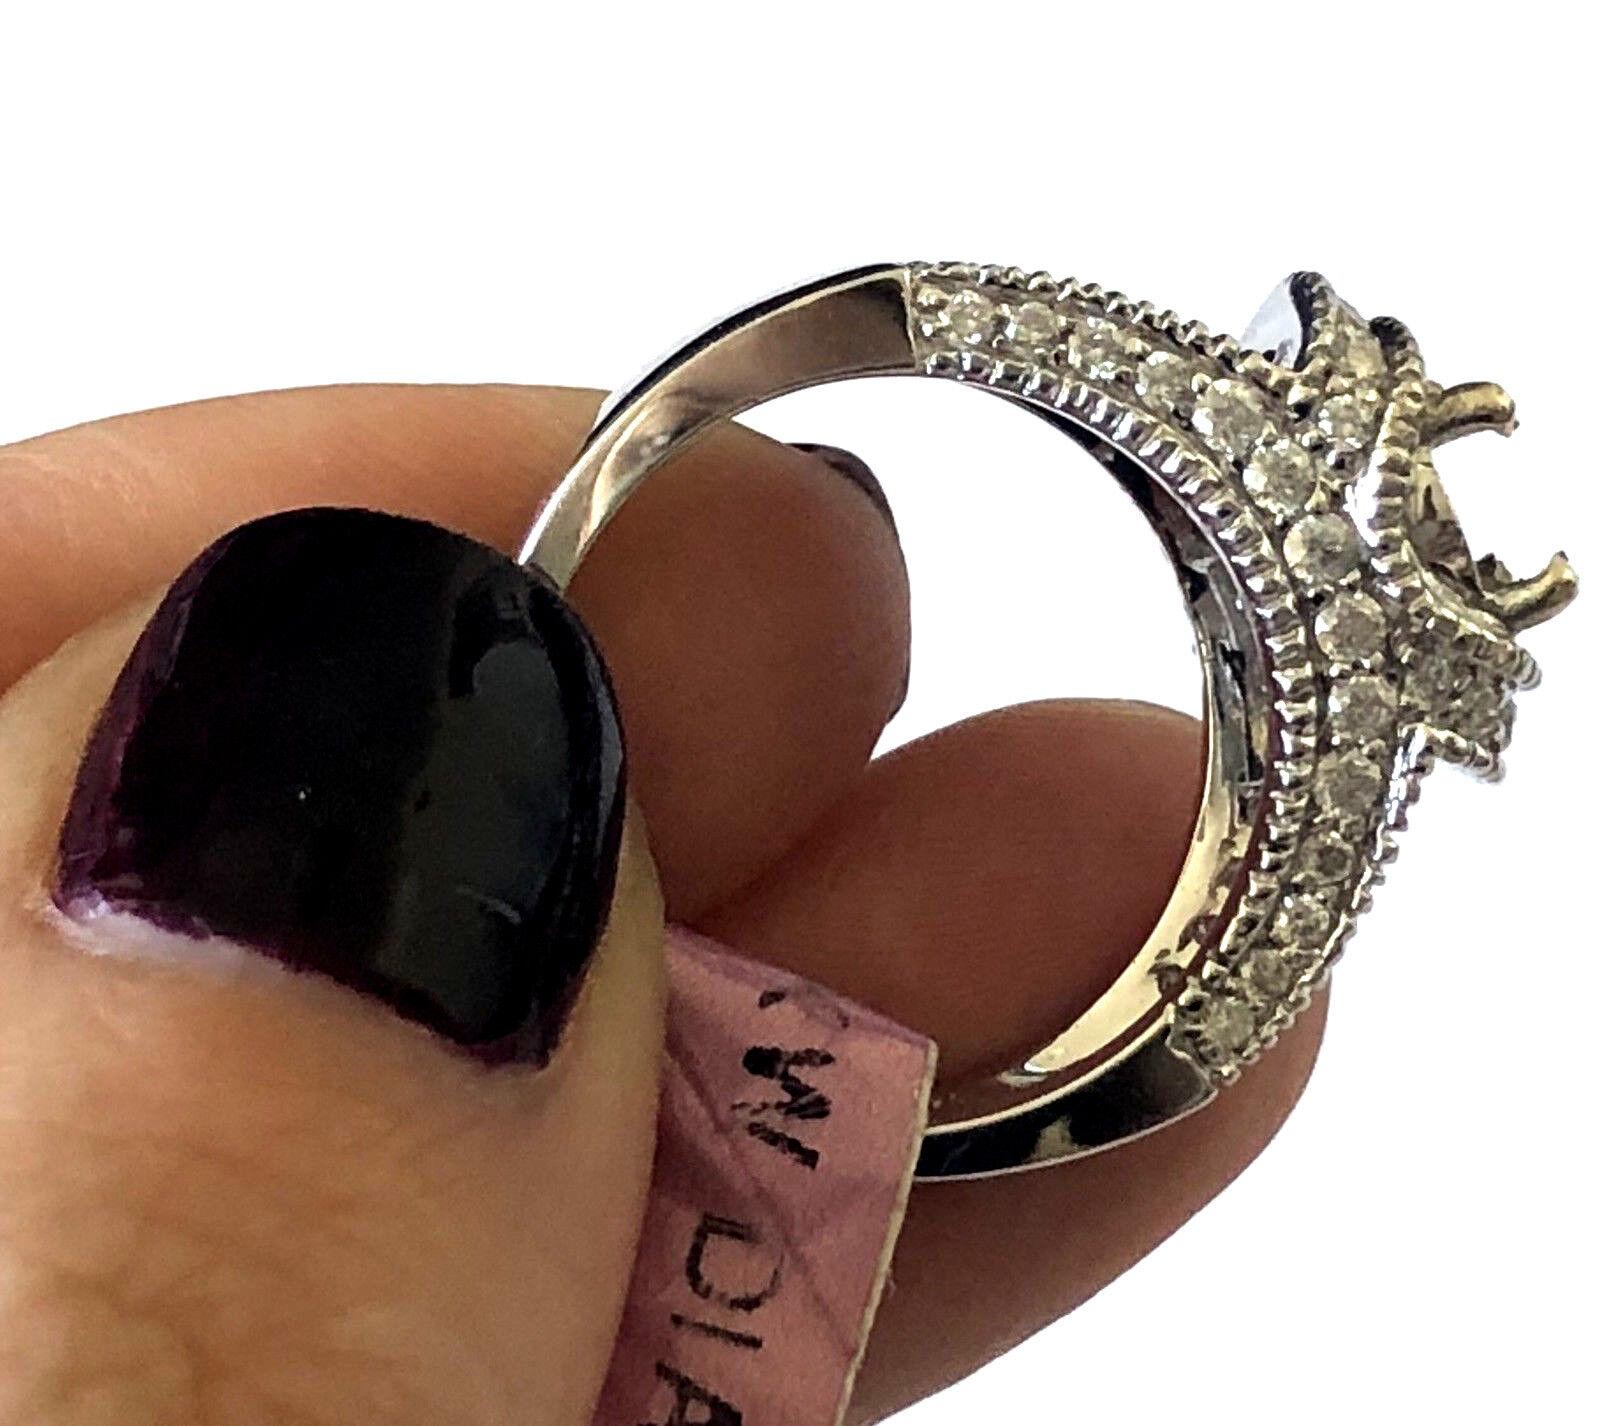 NOS 18KT BNL White gold Engagement Ring Setting 72 Diamond 0.87cttw Sz 6.5  2828